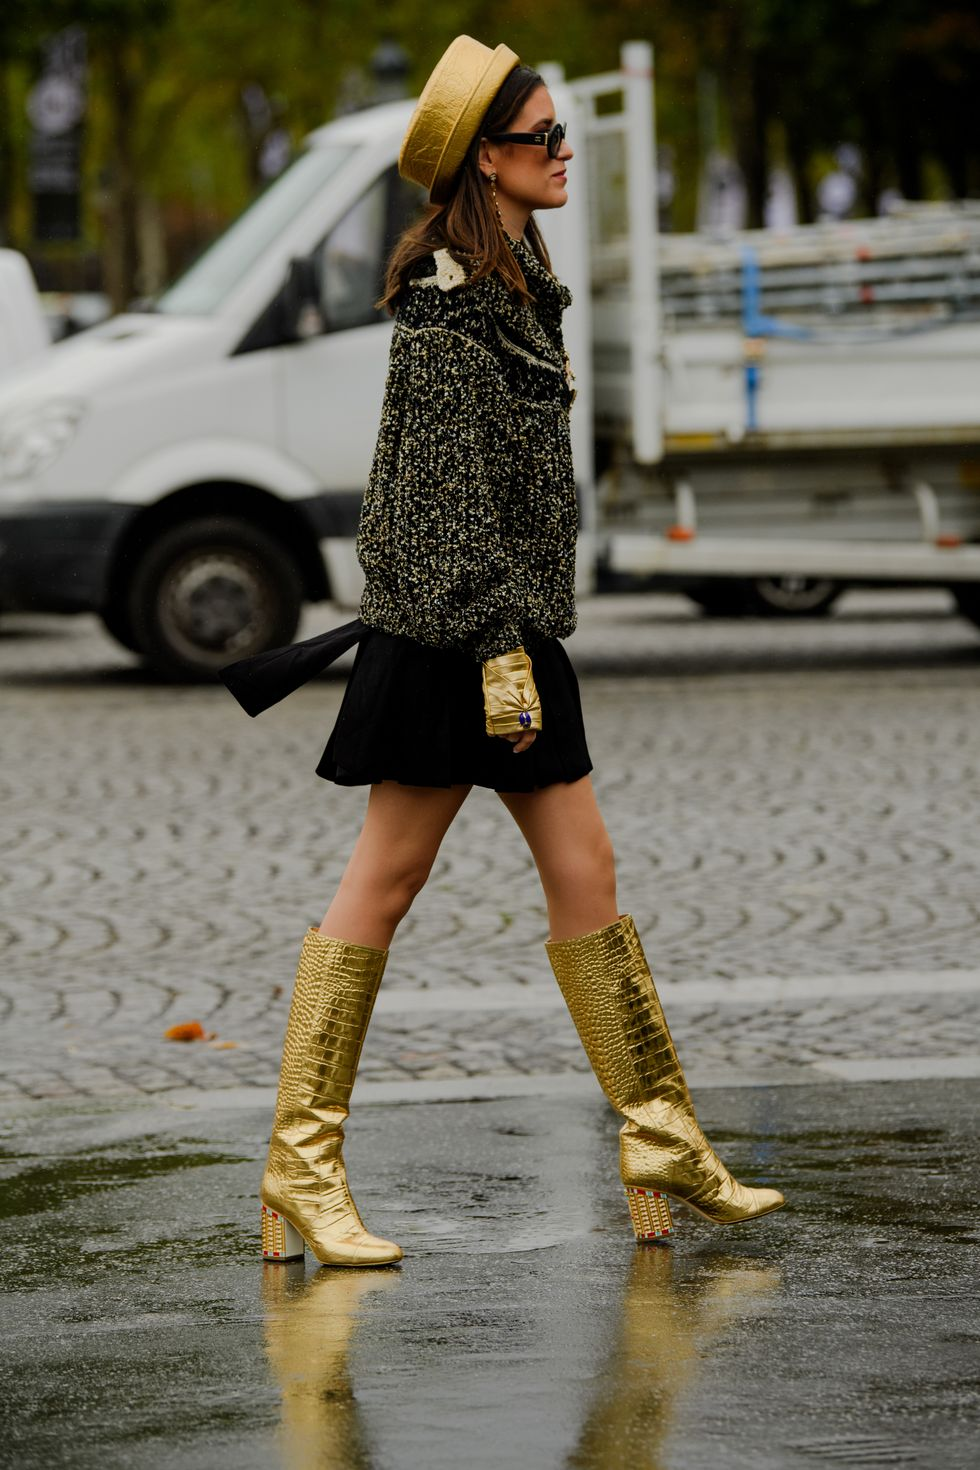 https://hips.hearstapps.com/hmg-prod.s3.amazonaws.com/images/paris-fashion-week-pfw-street-style-ss20-day-7-by-tyler-joe-034-1570111683.jpg?crop=1xw:1xh;center,top&resize=980:*